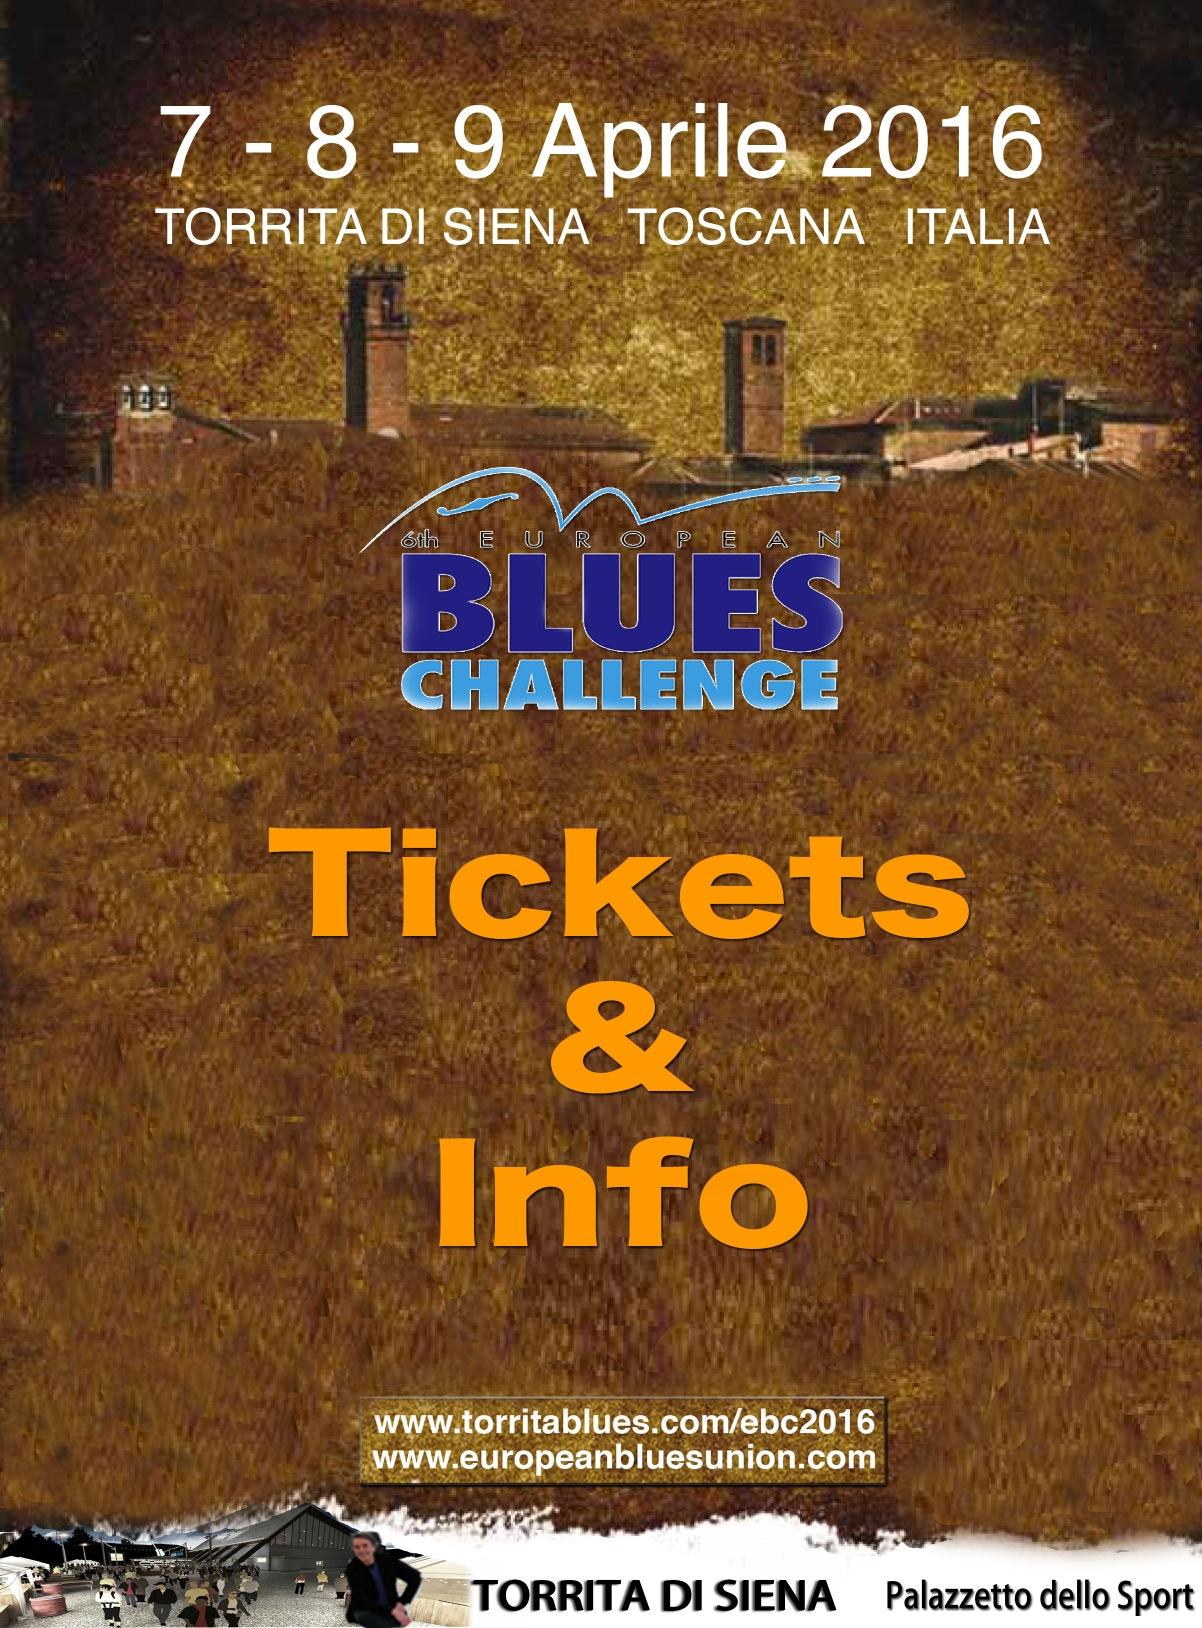 7 8 9 tickets e info